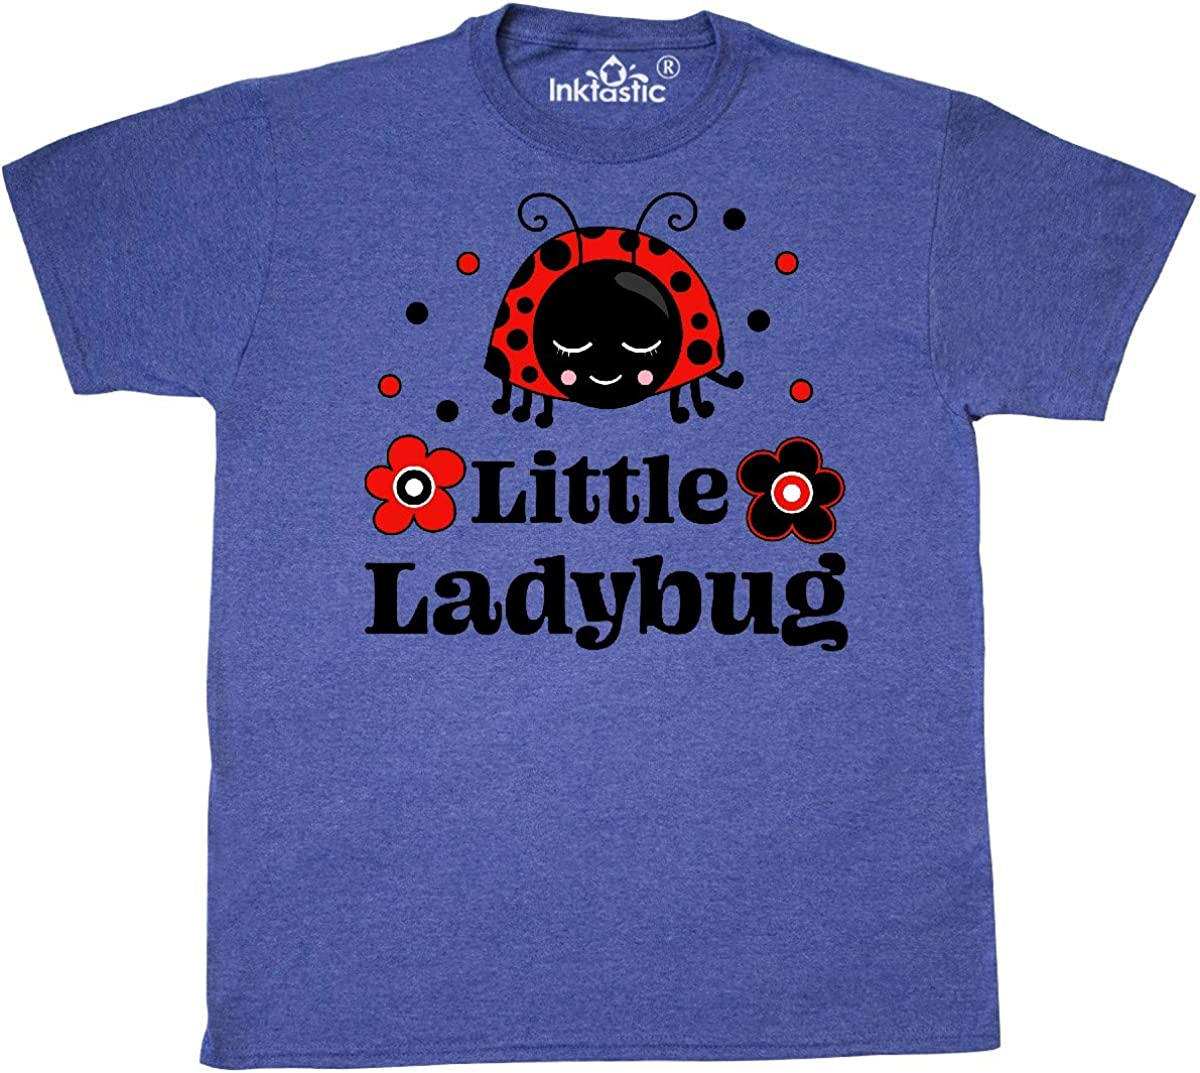 inktastic Little Ladybug with Flowers T-Shirt